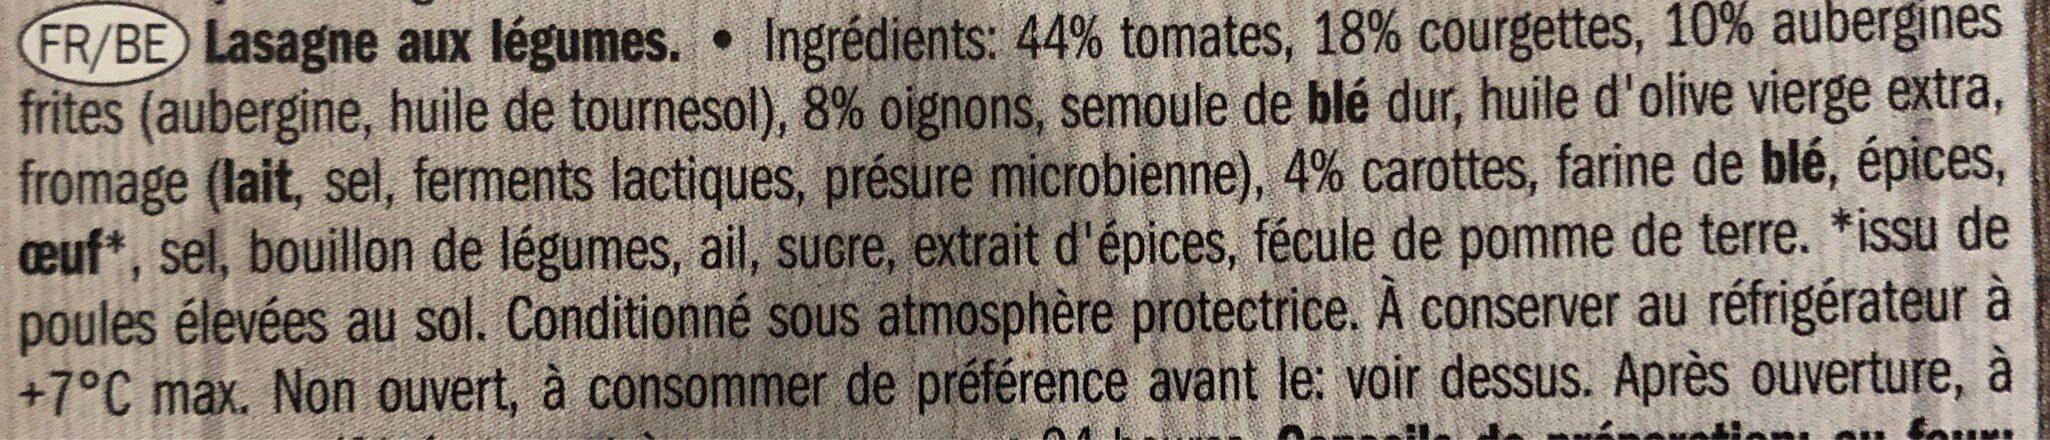 Lasagne vegetariennes - Ingrediënten